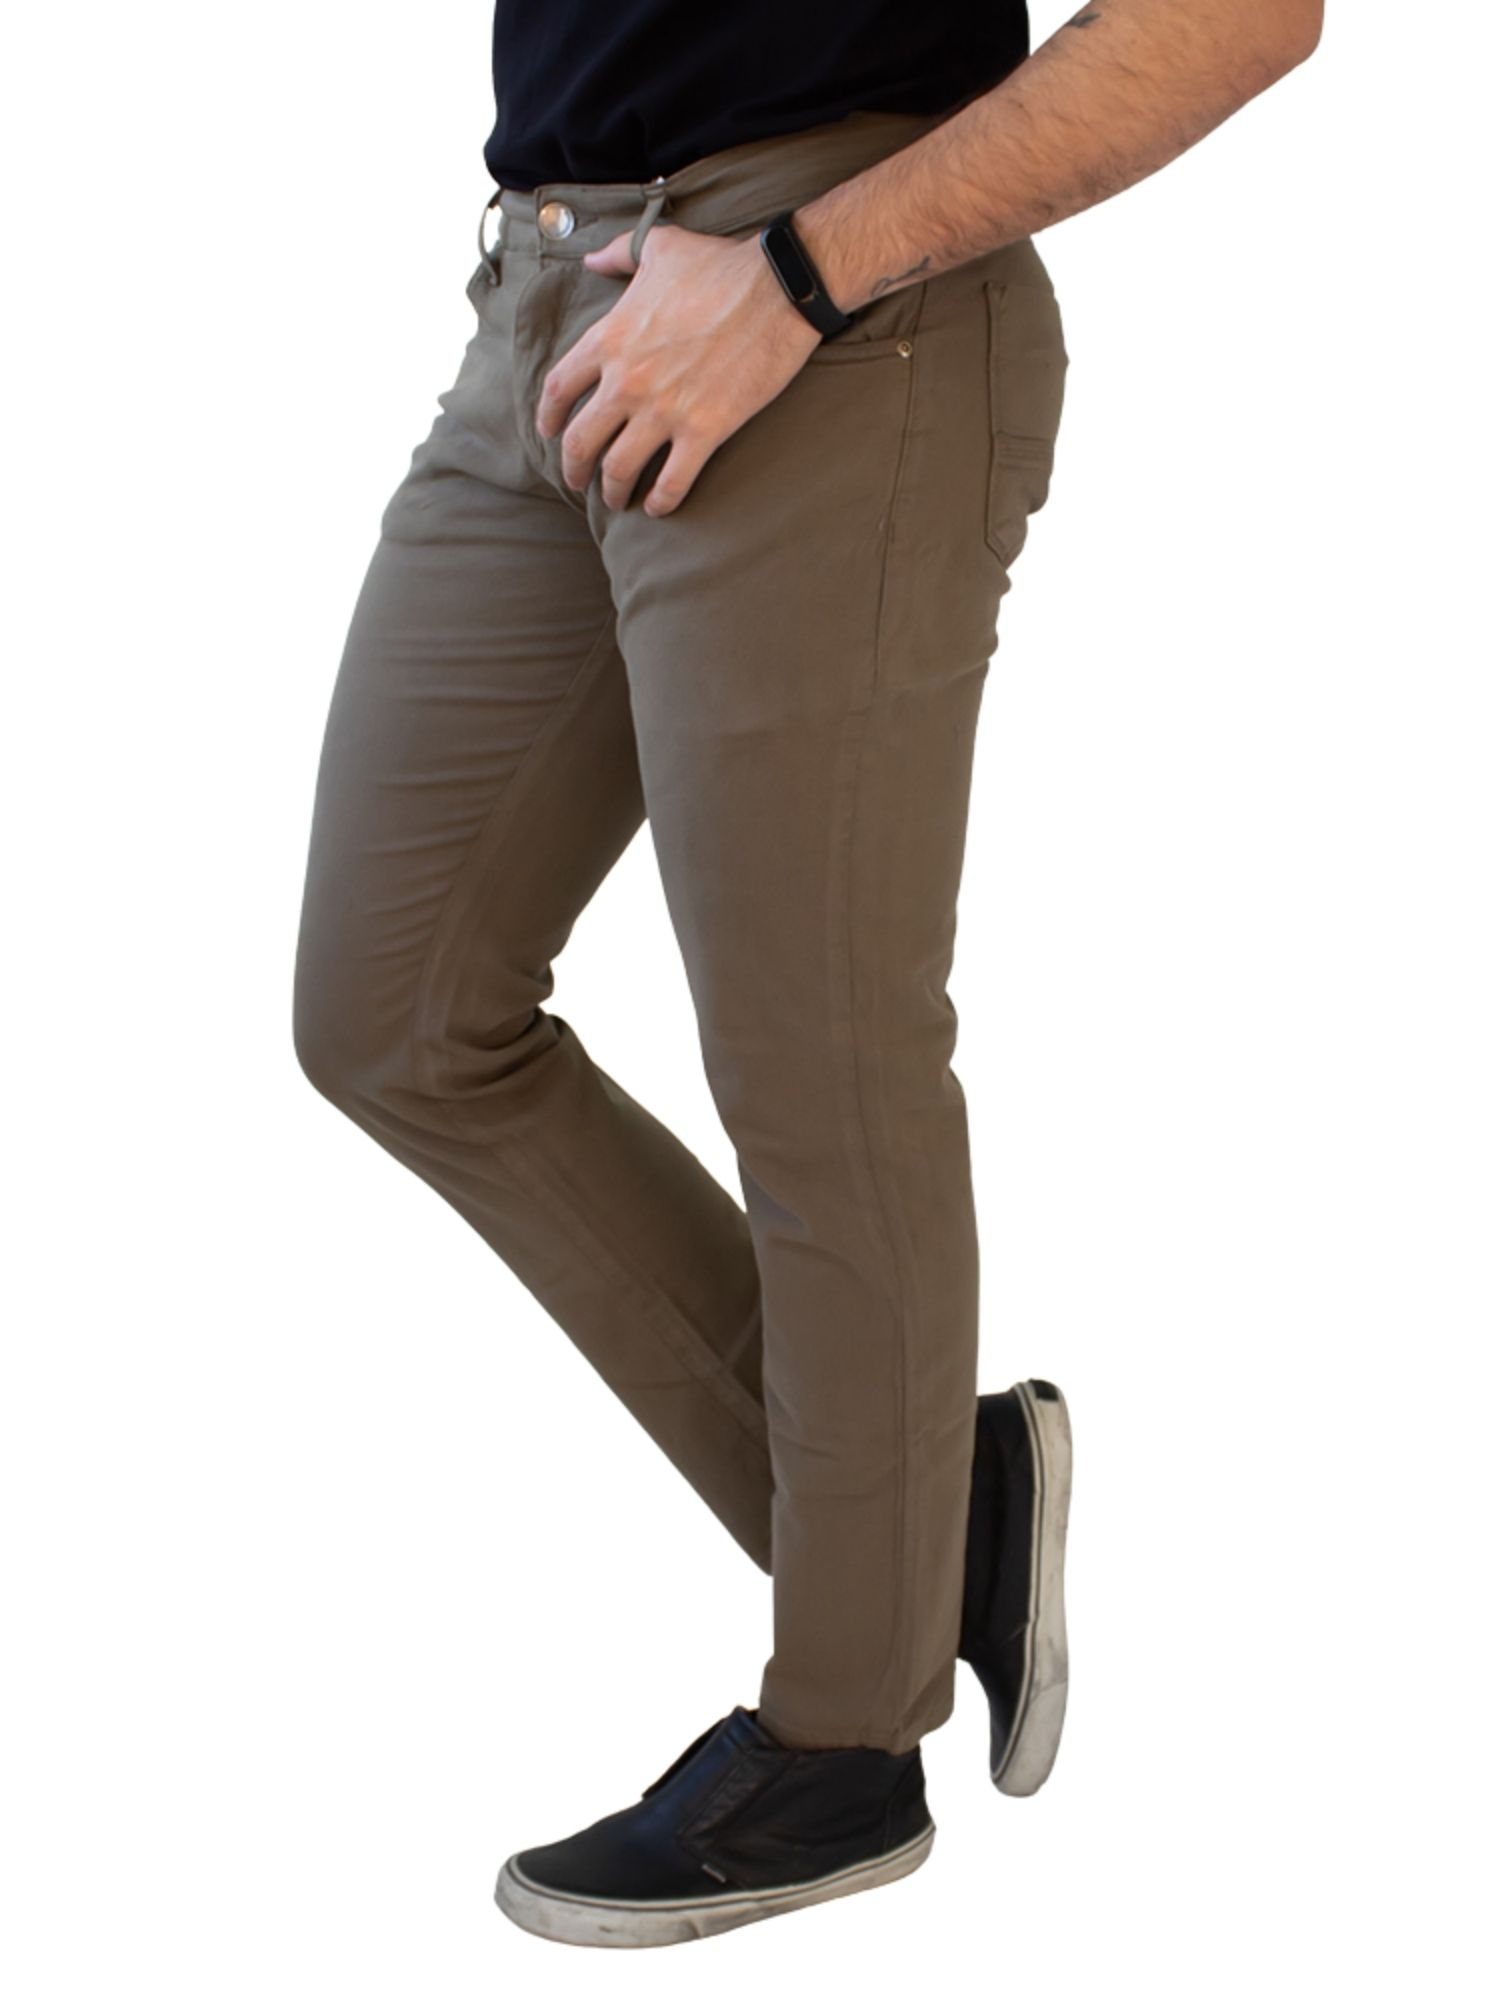 Calça Masculina Skinny Color Anticorpus  22420